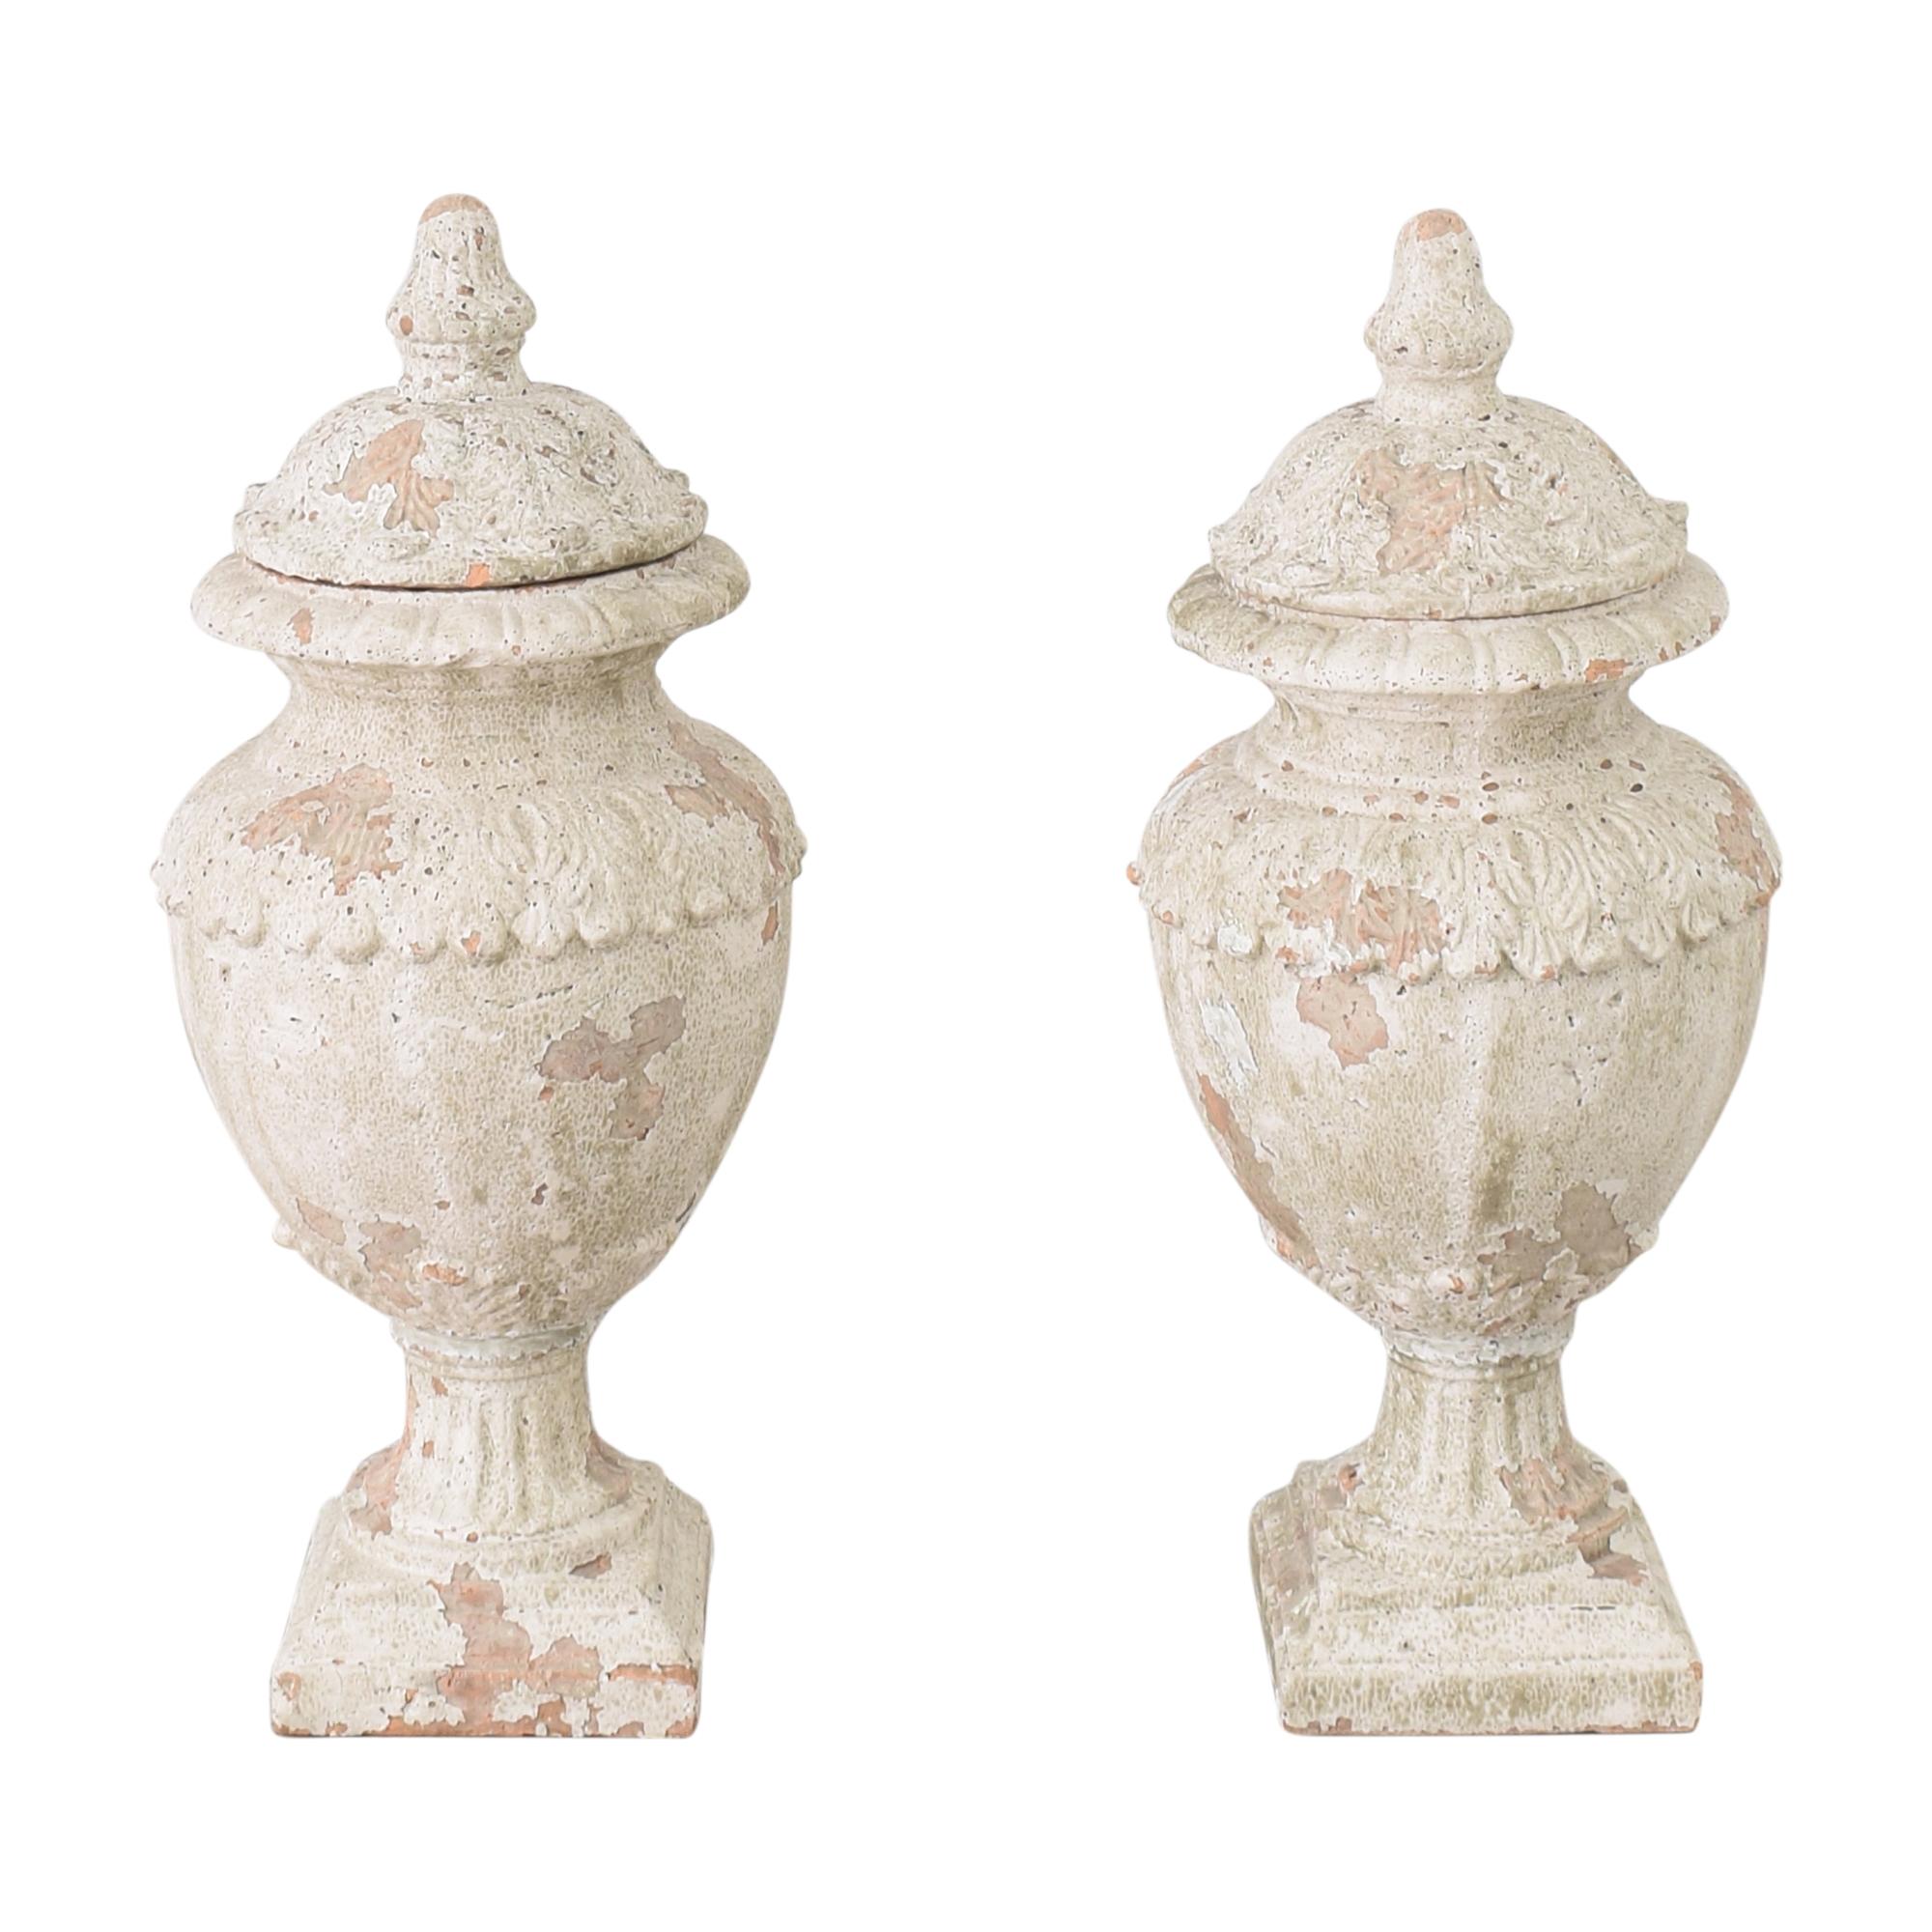 shop  Decorative Distressed Urns online